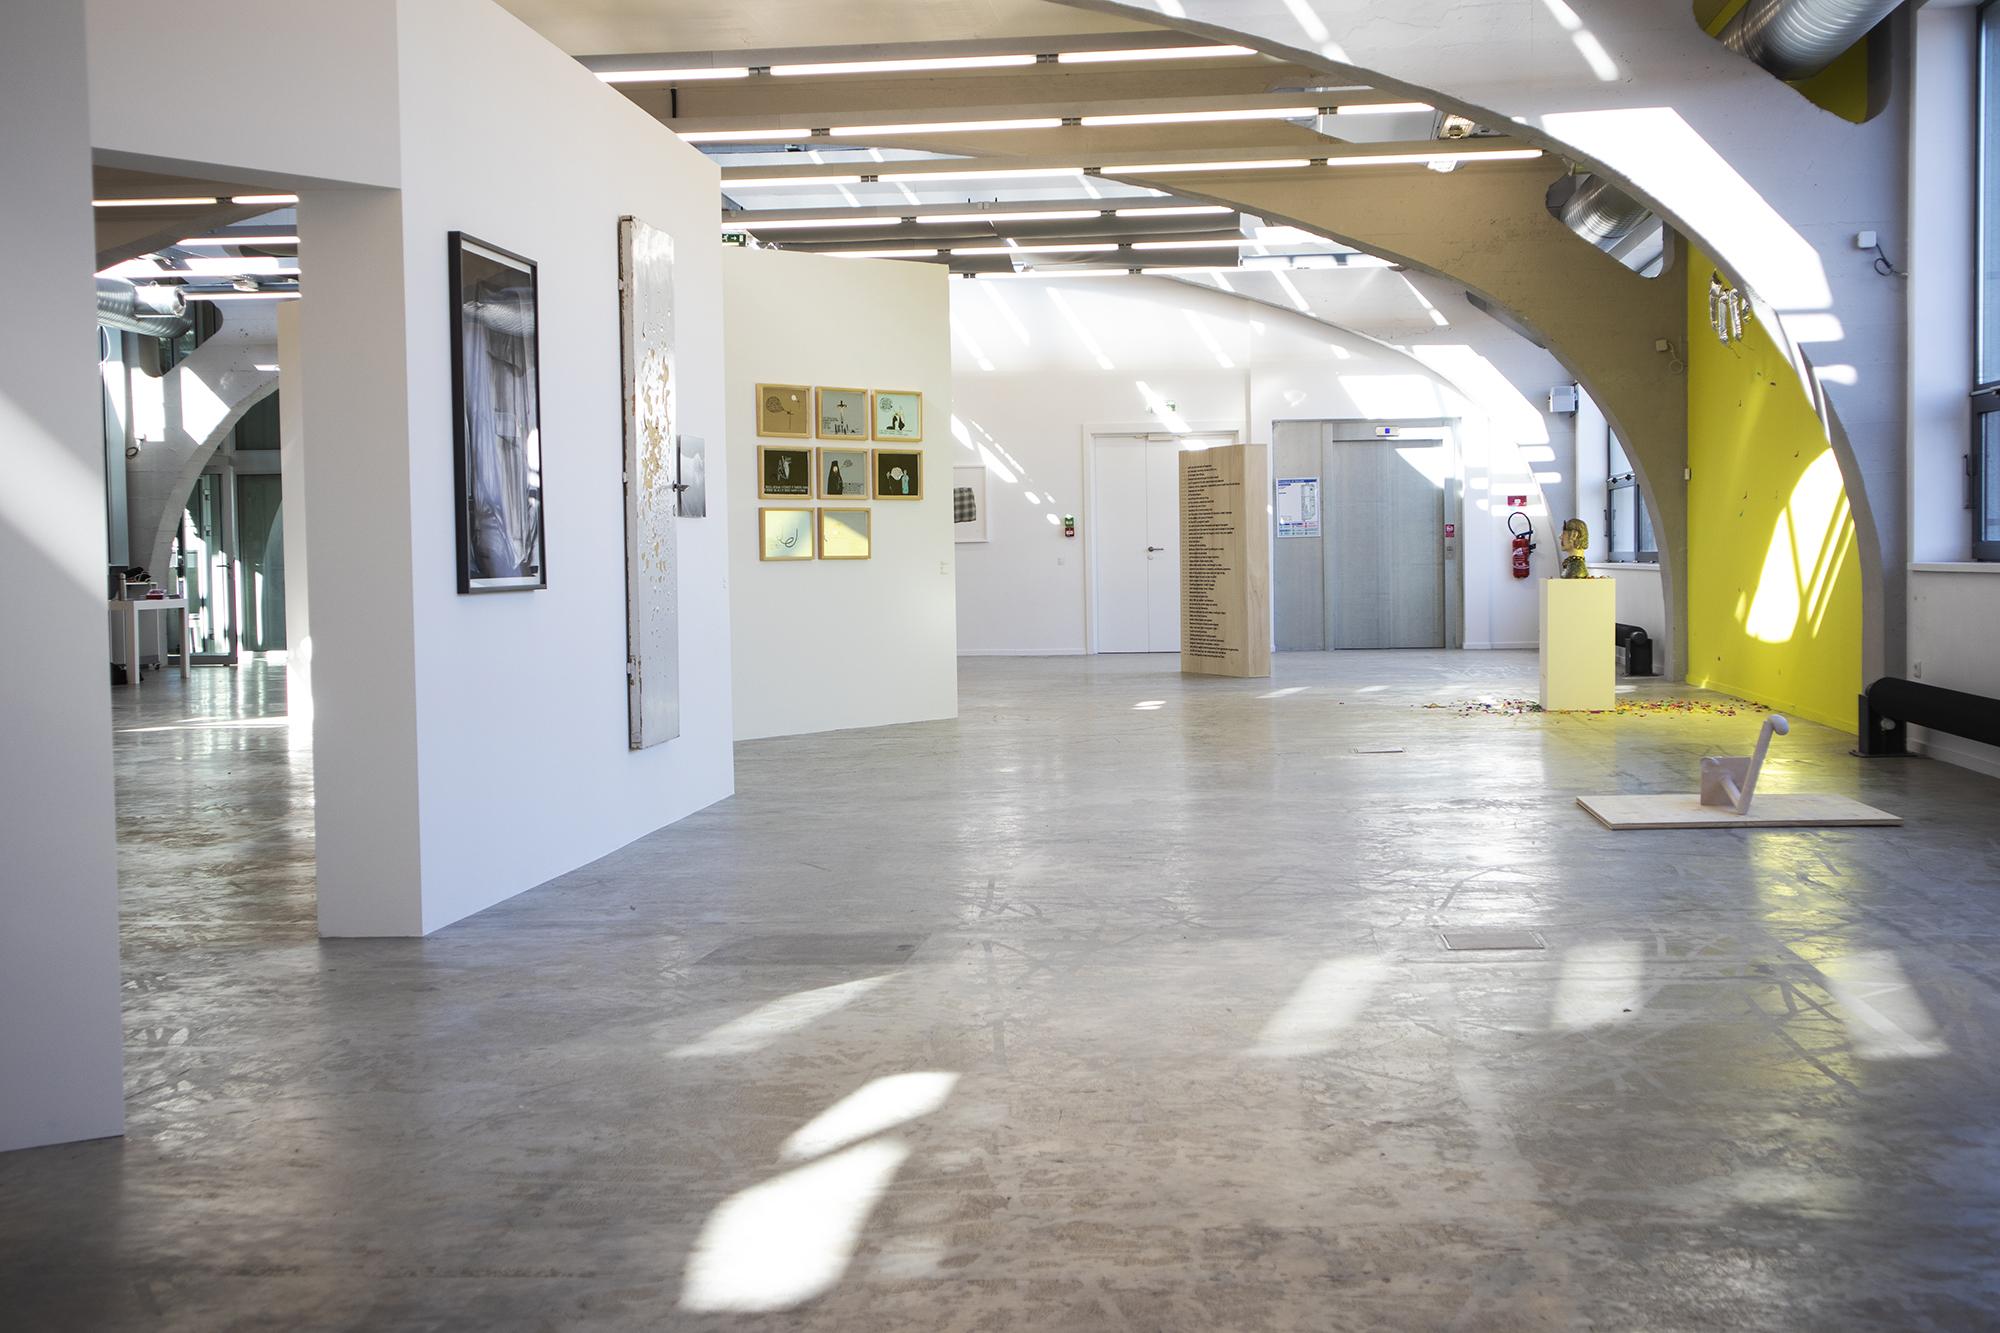 Alex-Mirutziu-Because-Kunsthalle-Mulhouse-9.jpg